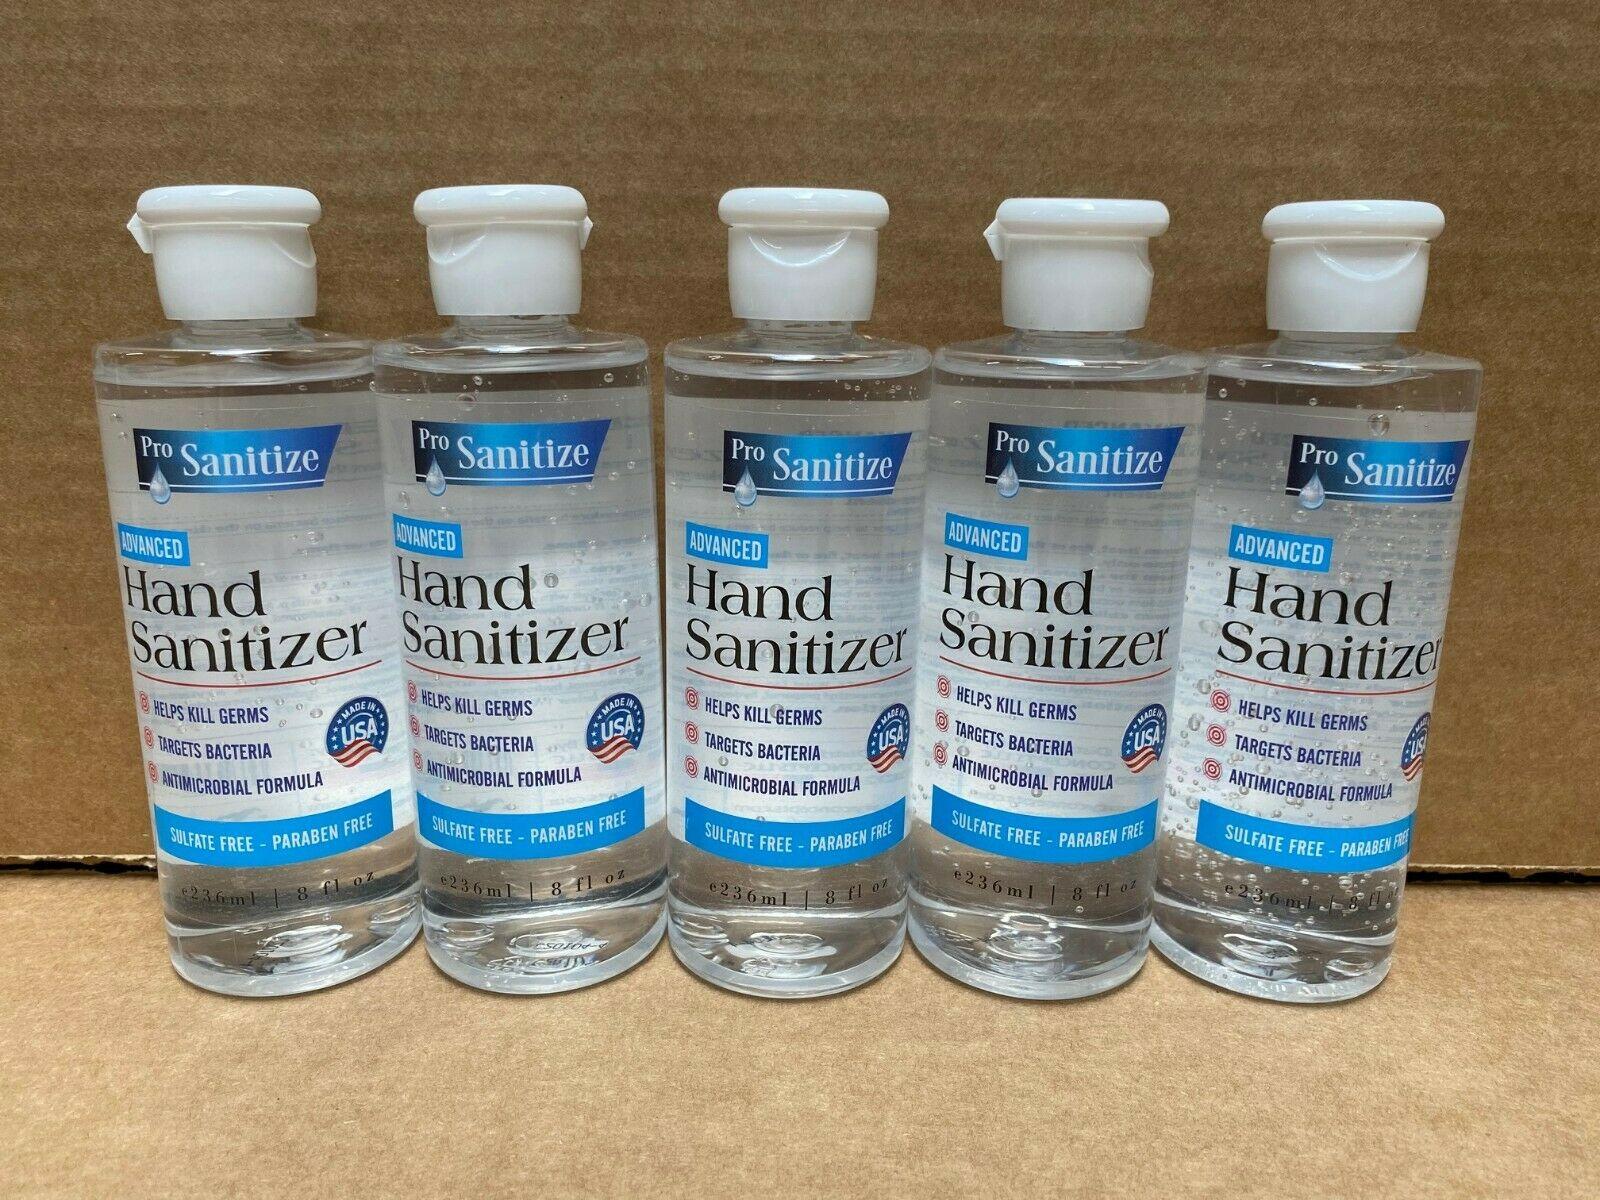 Pro hand sanitizer